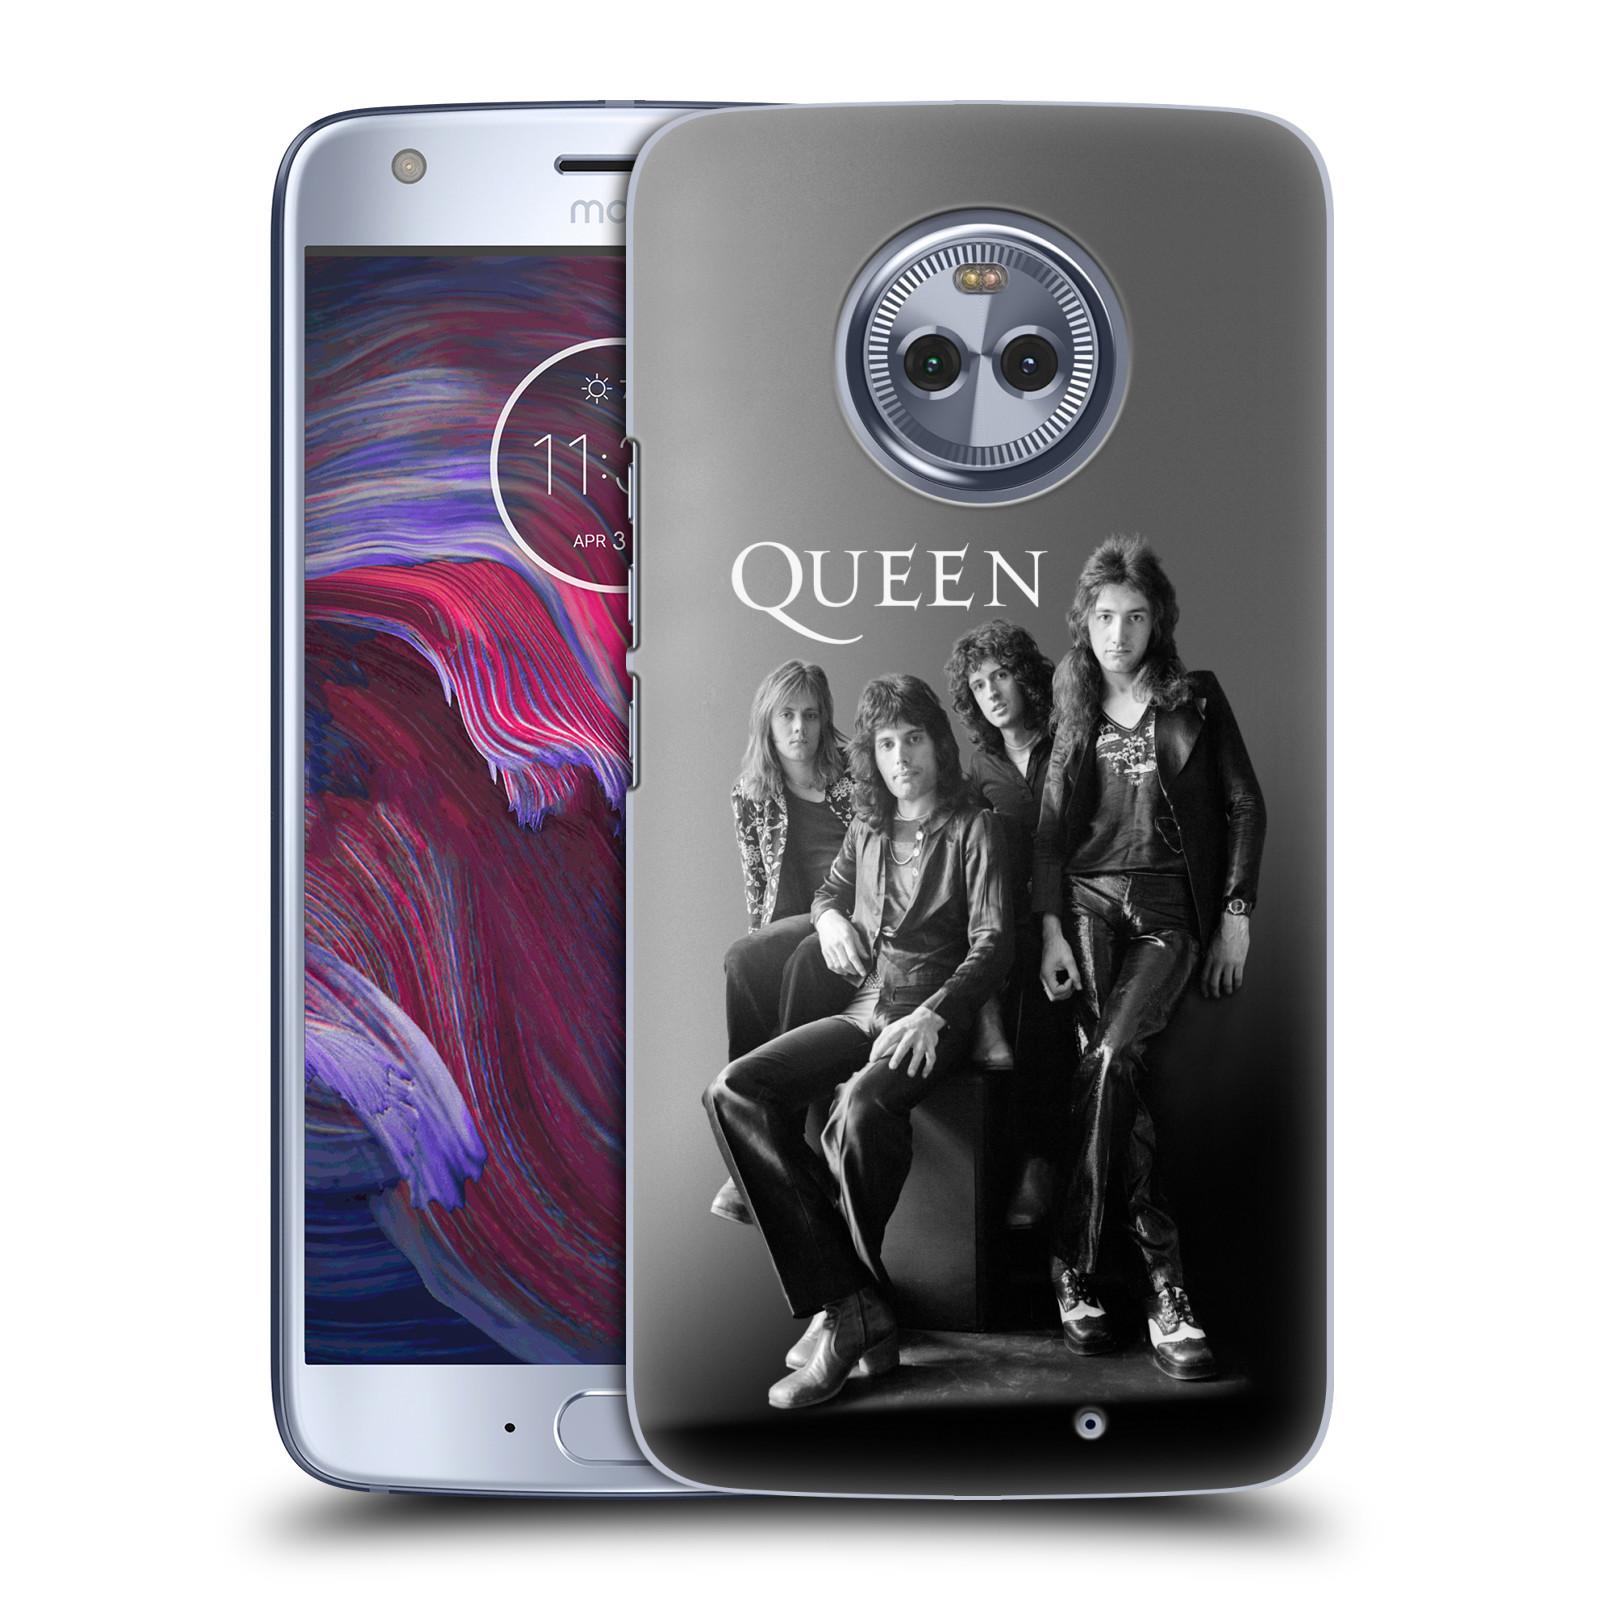 Plastové pouzdro na mobil Lenovo Moto X4 - Head Case - Queen - Skupina